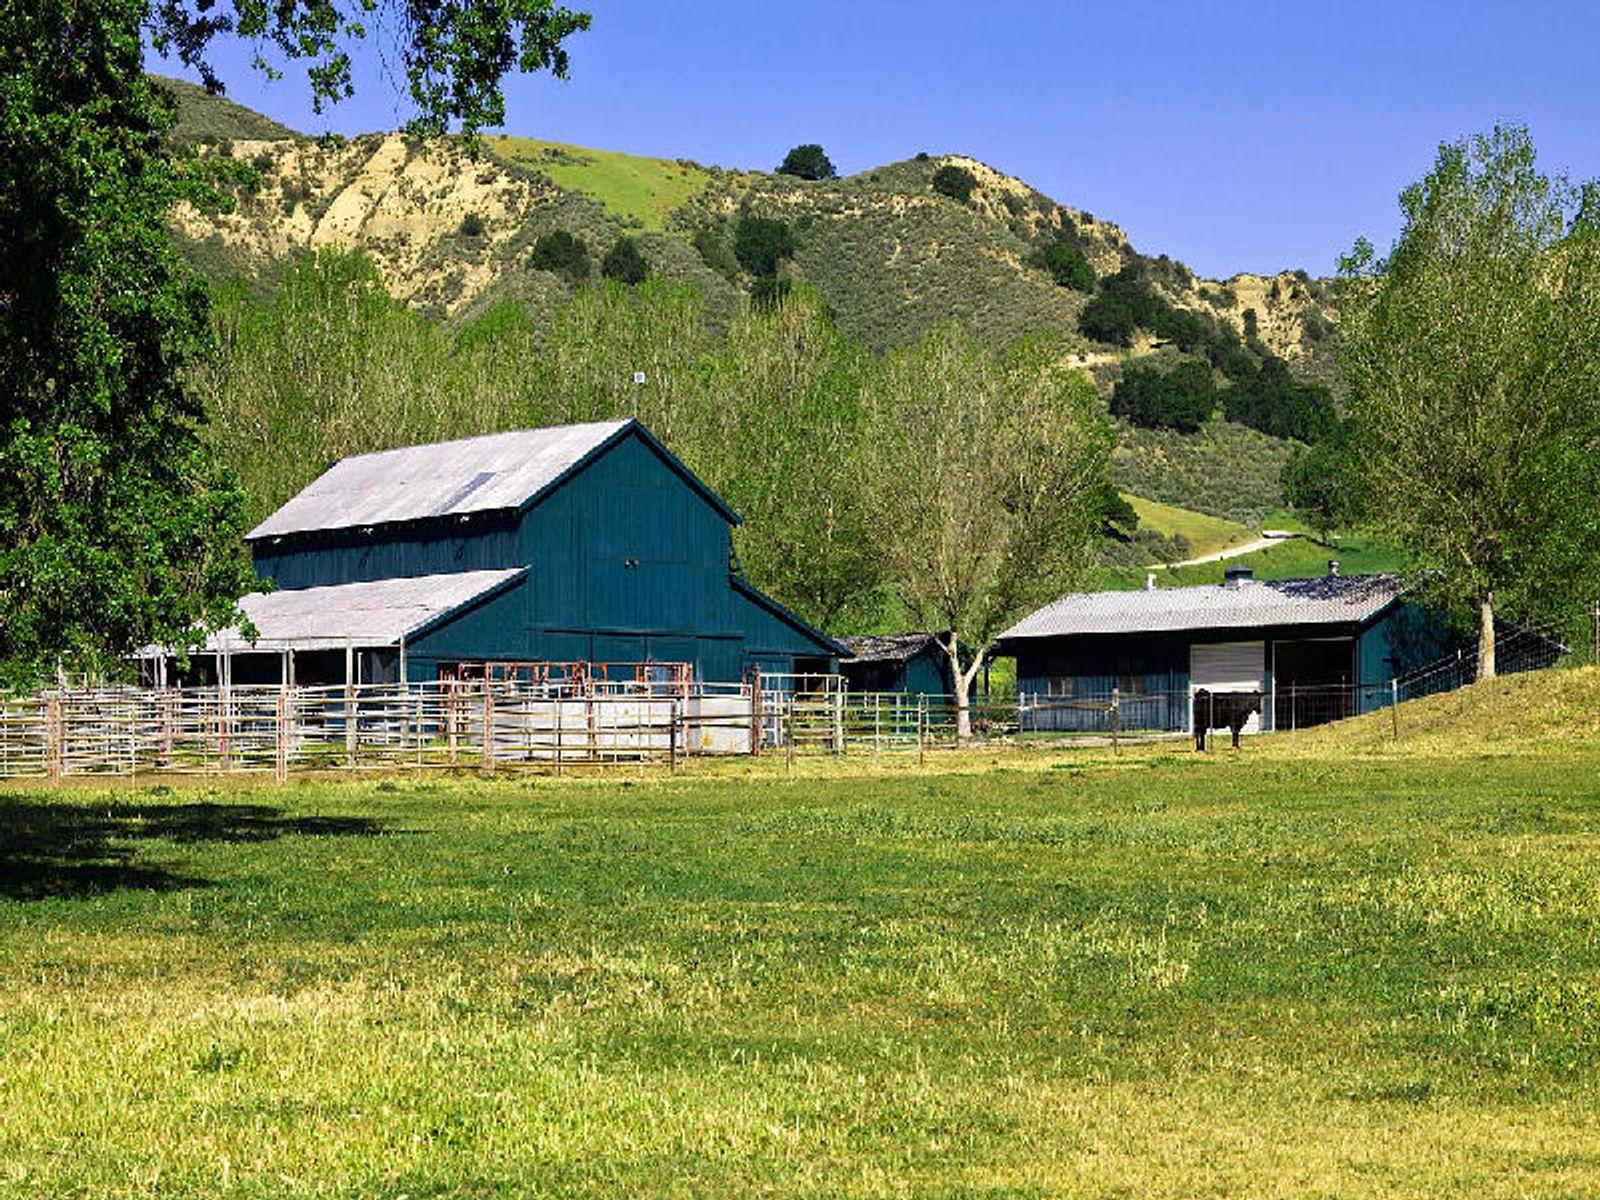 Bar-Go-Ranch